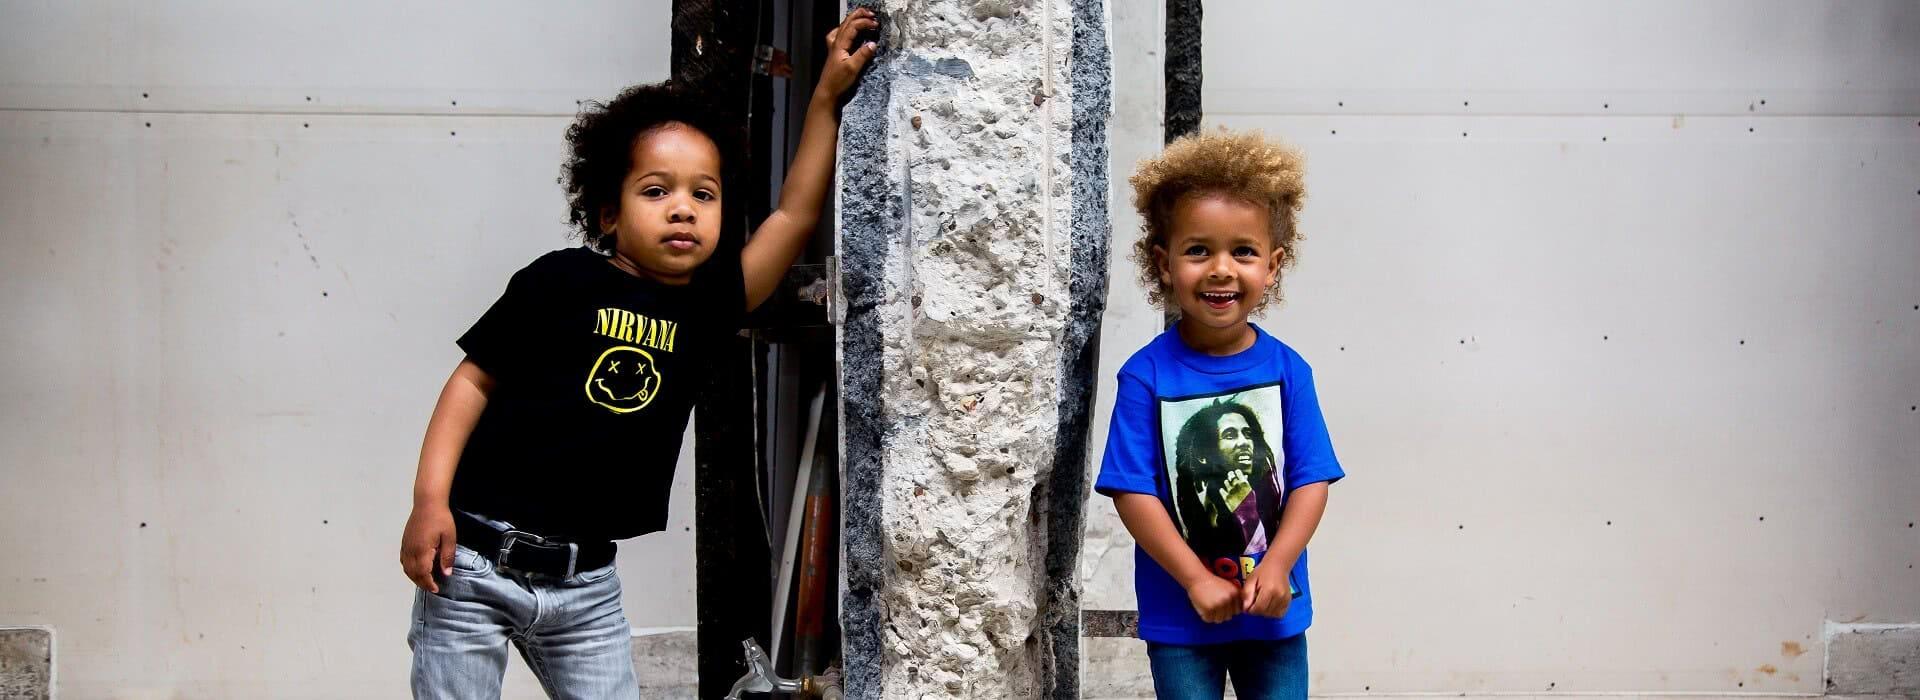 Kinder rock kleidung